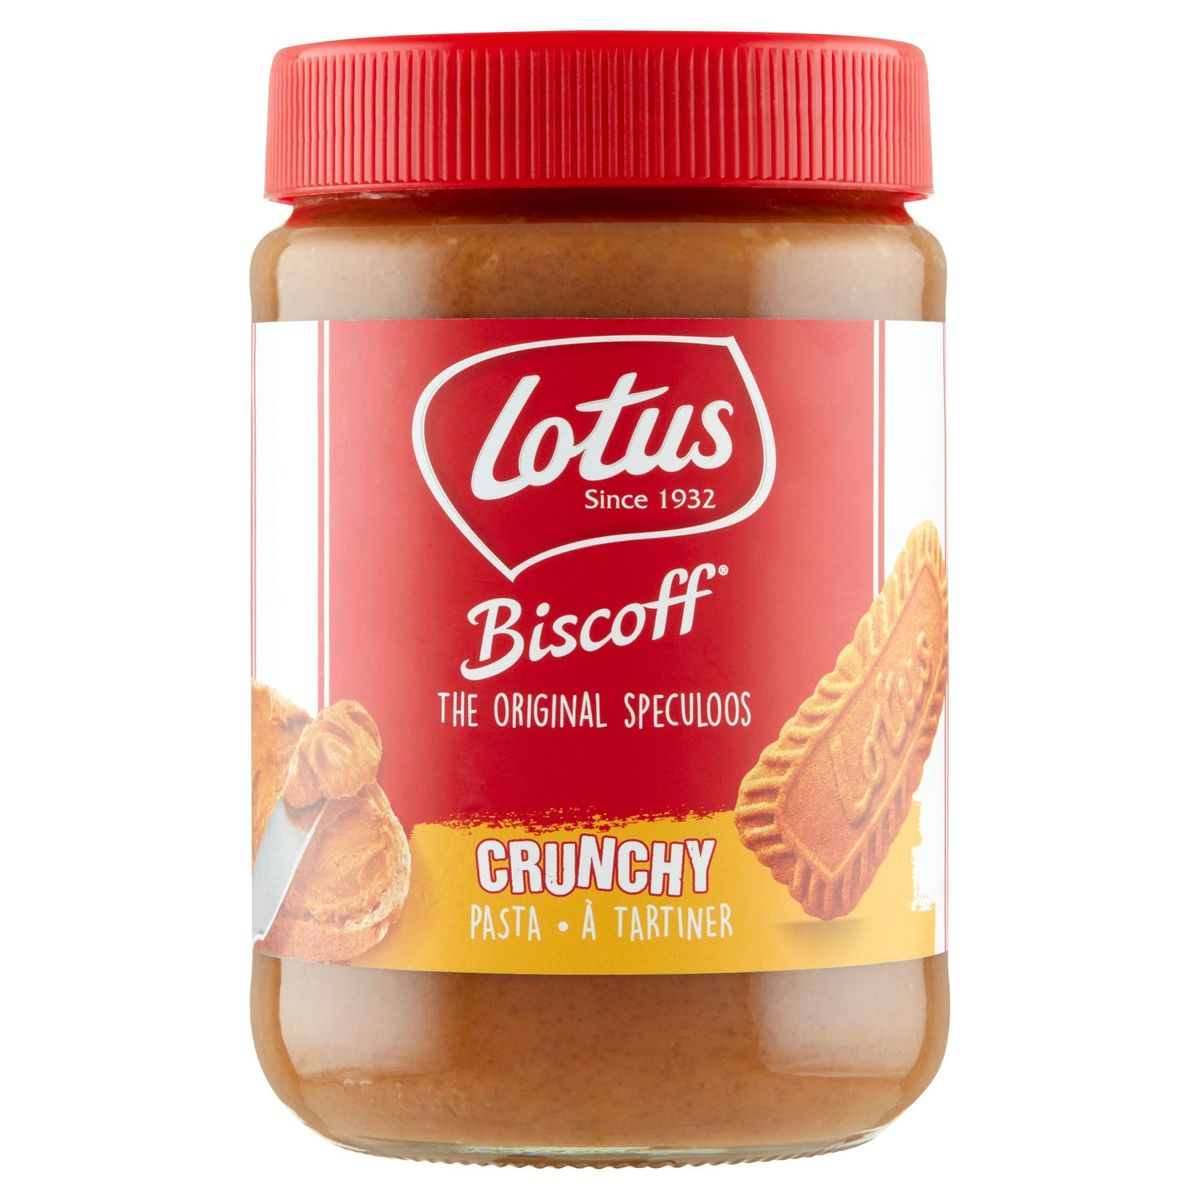 Lotus The Original Speculoos Crunchy à Tartiner 700 g